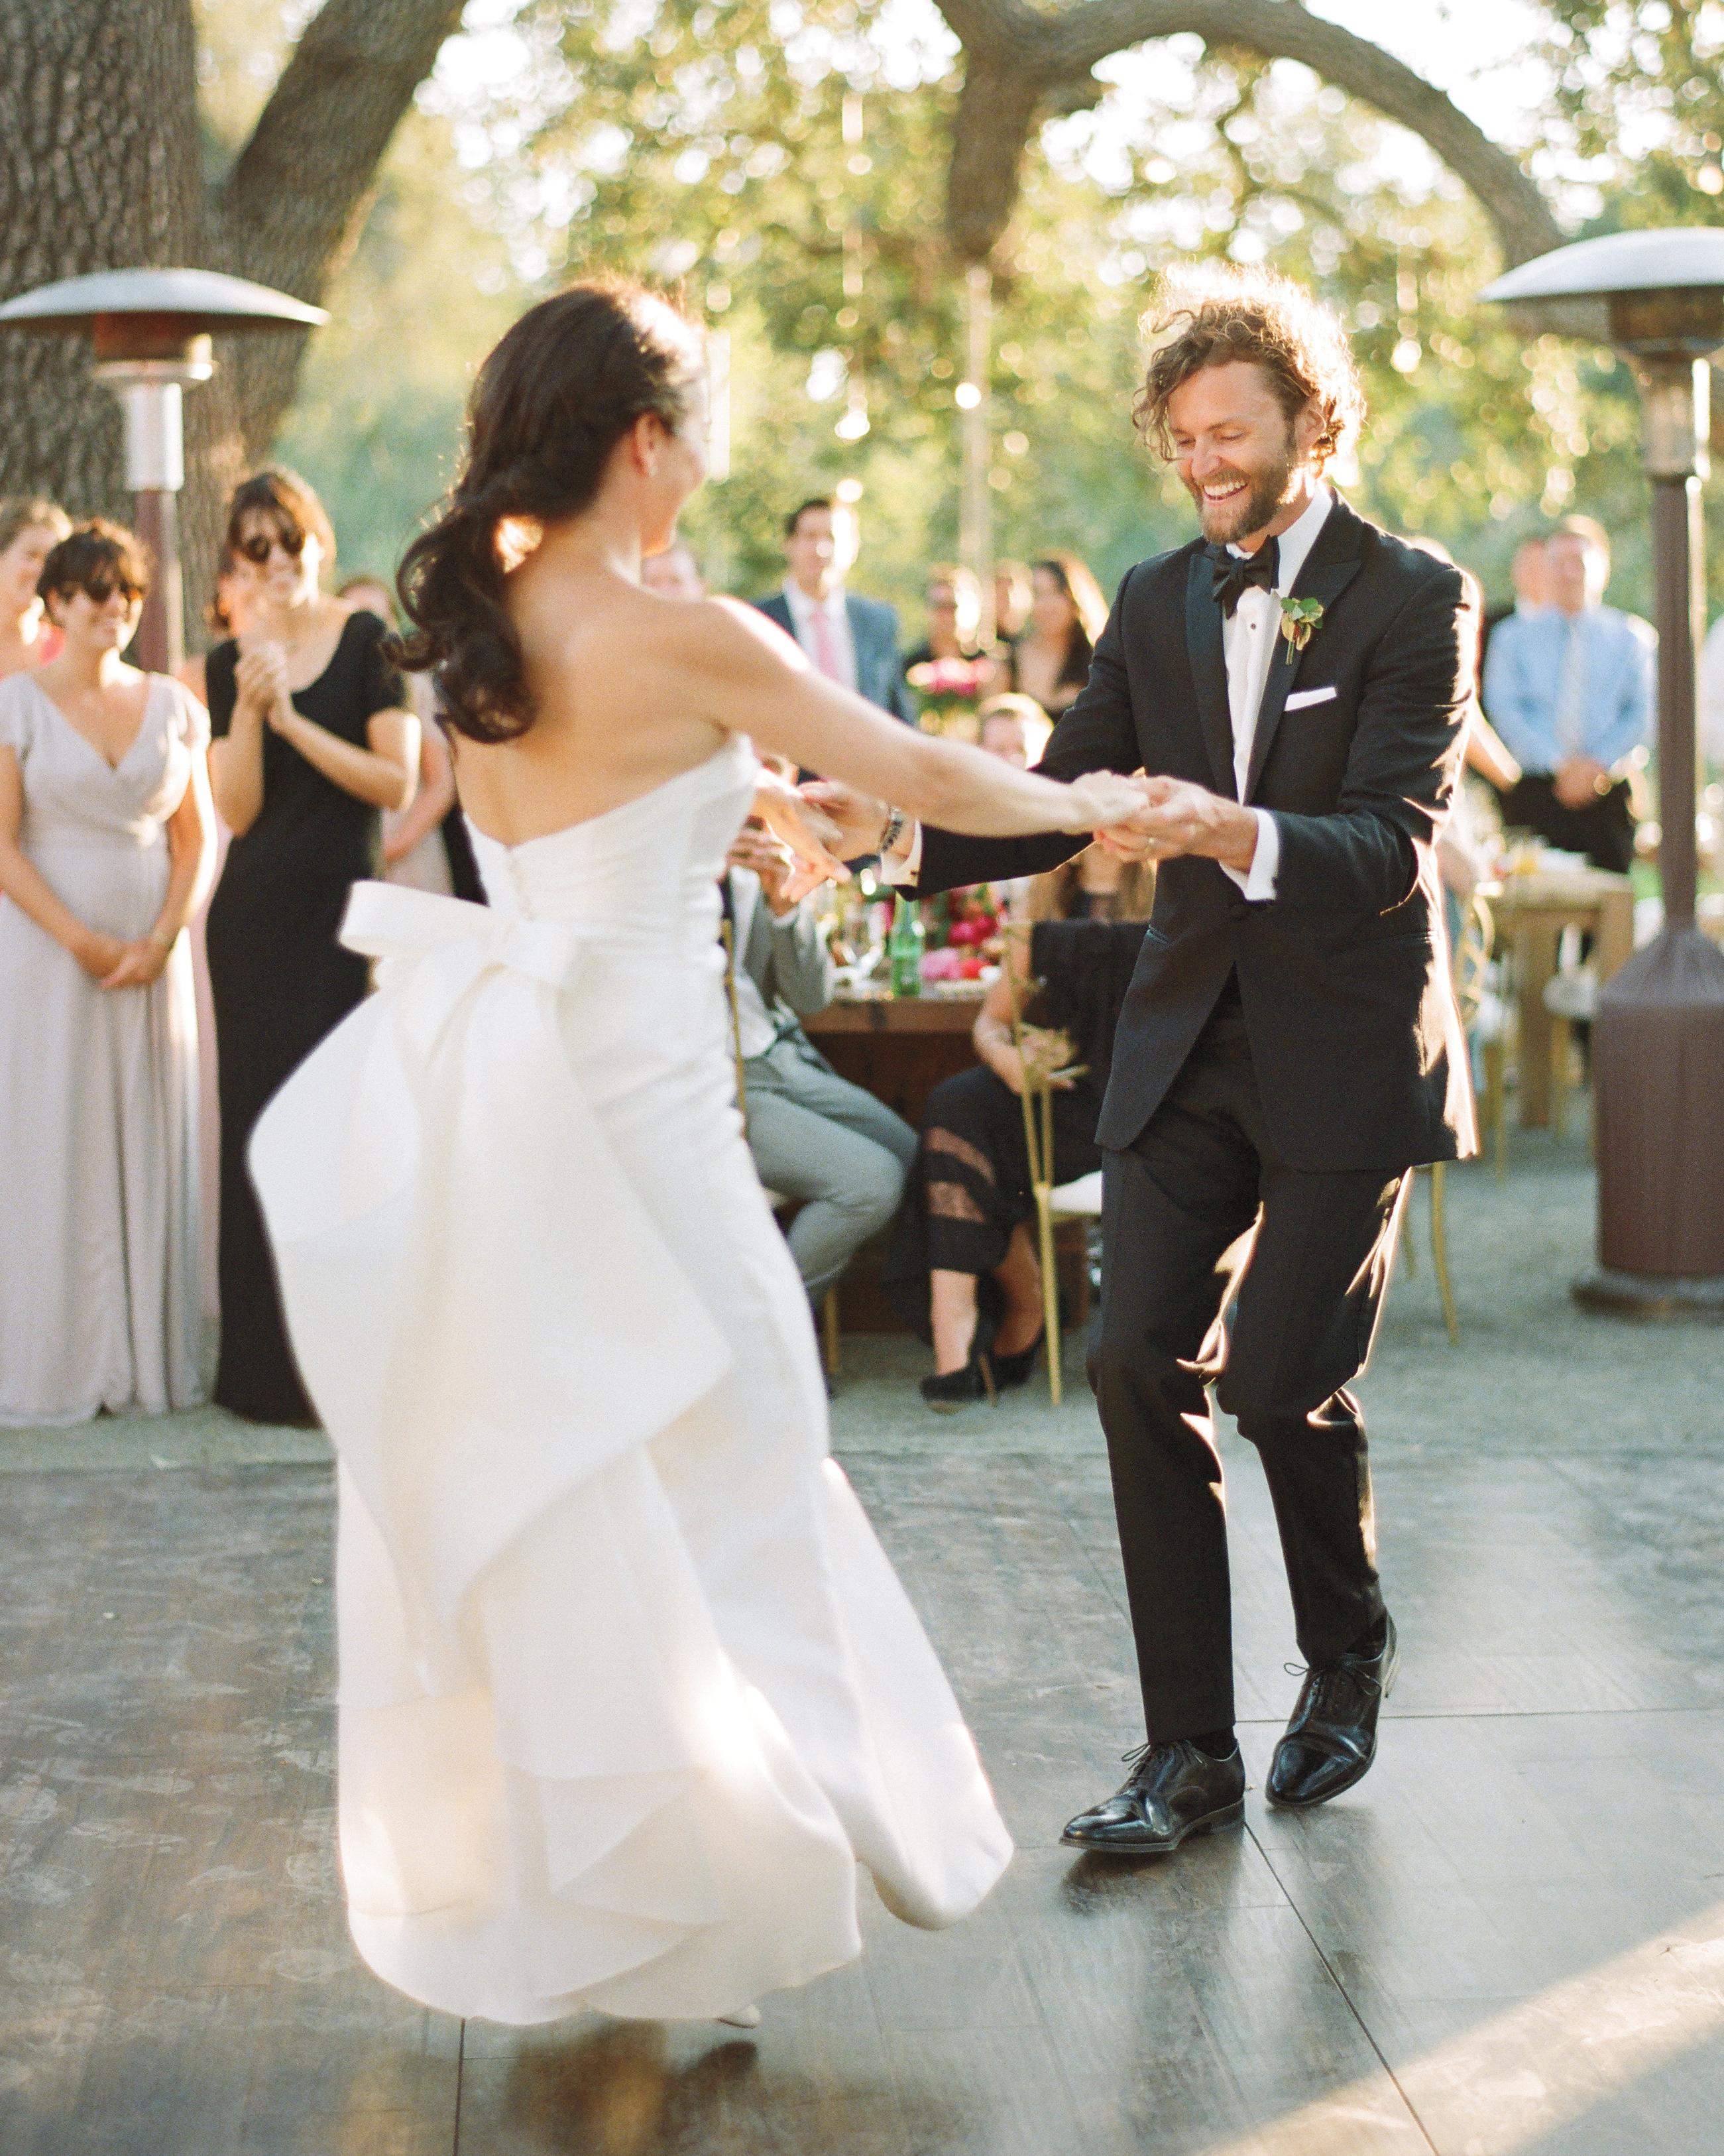 corrine-patrick-wedding-santa-ynez-44750001-s110842.jpg